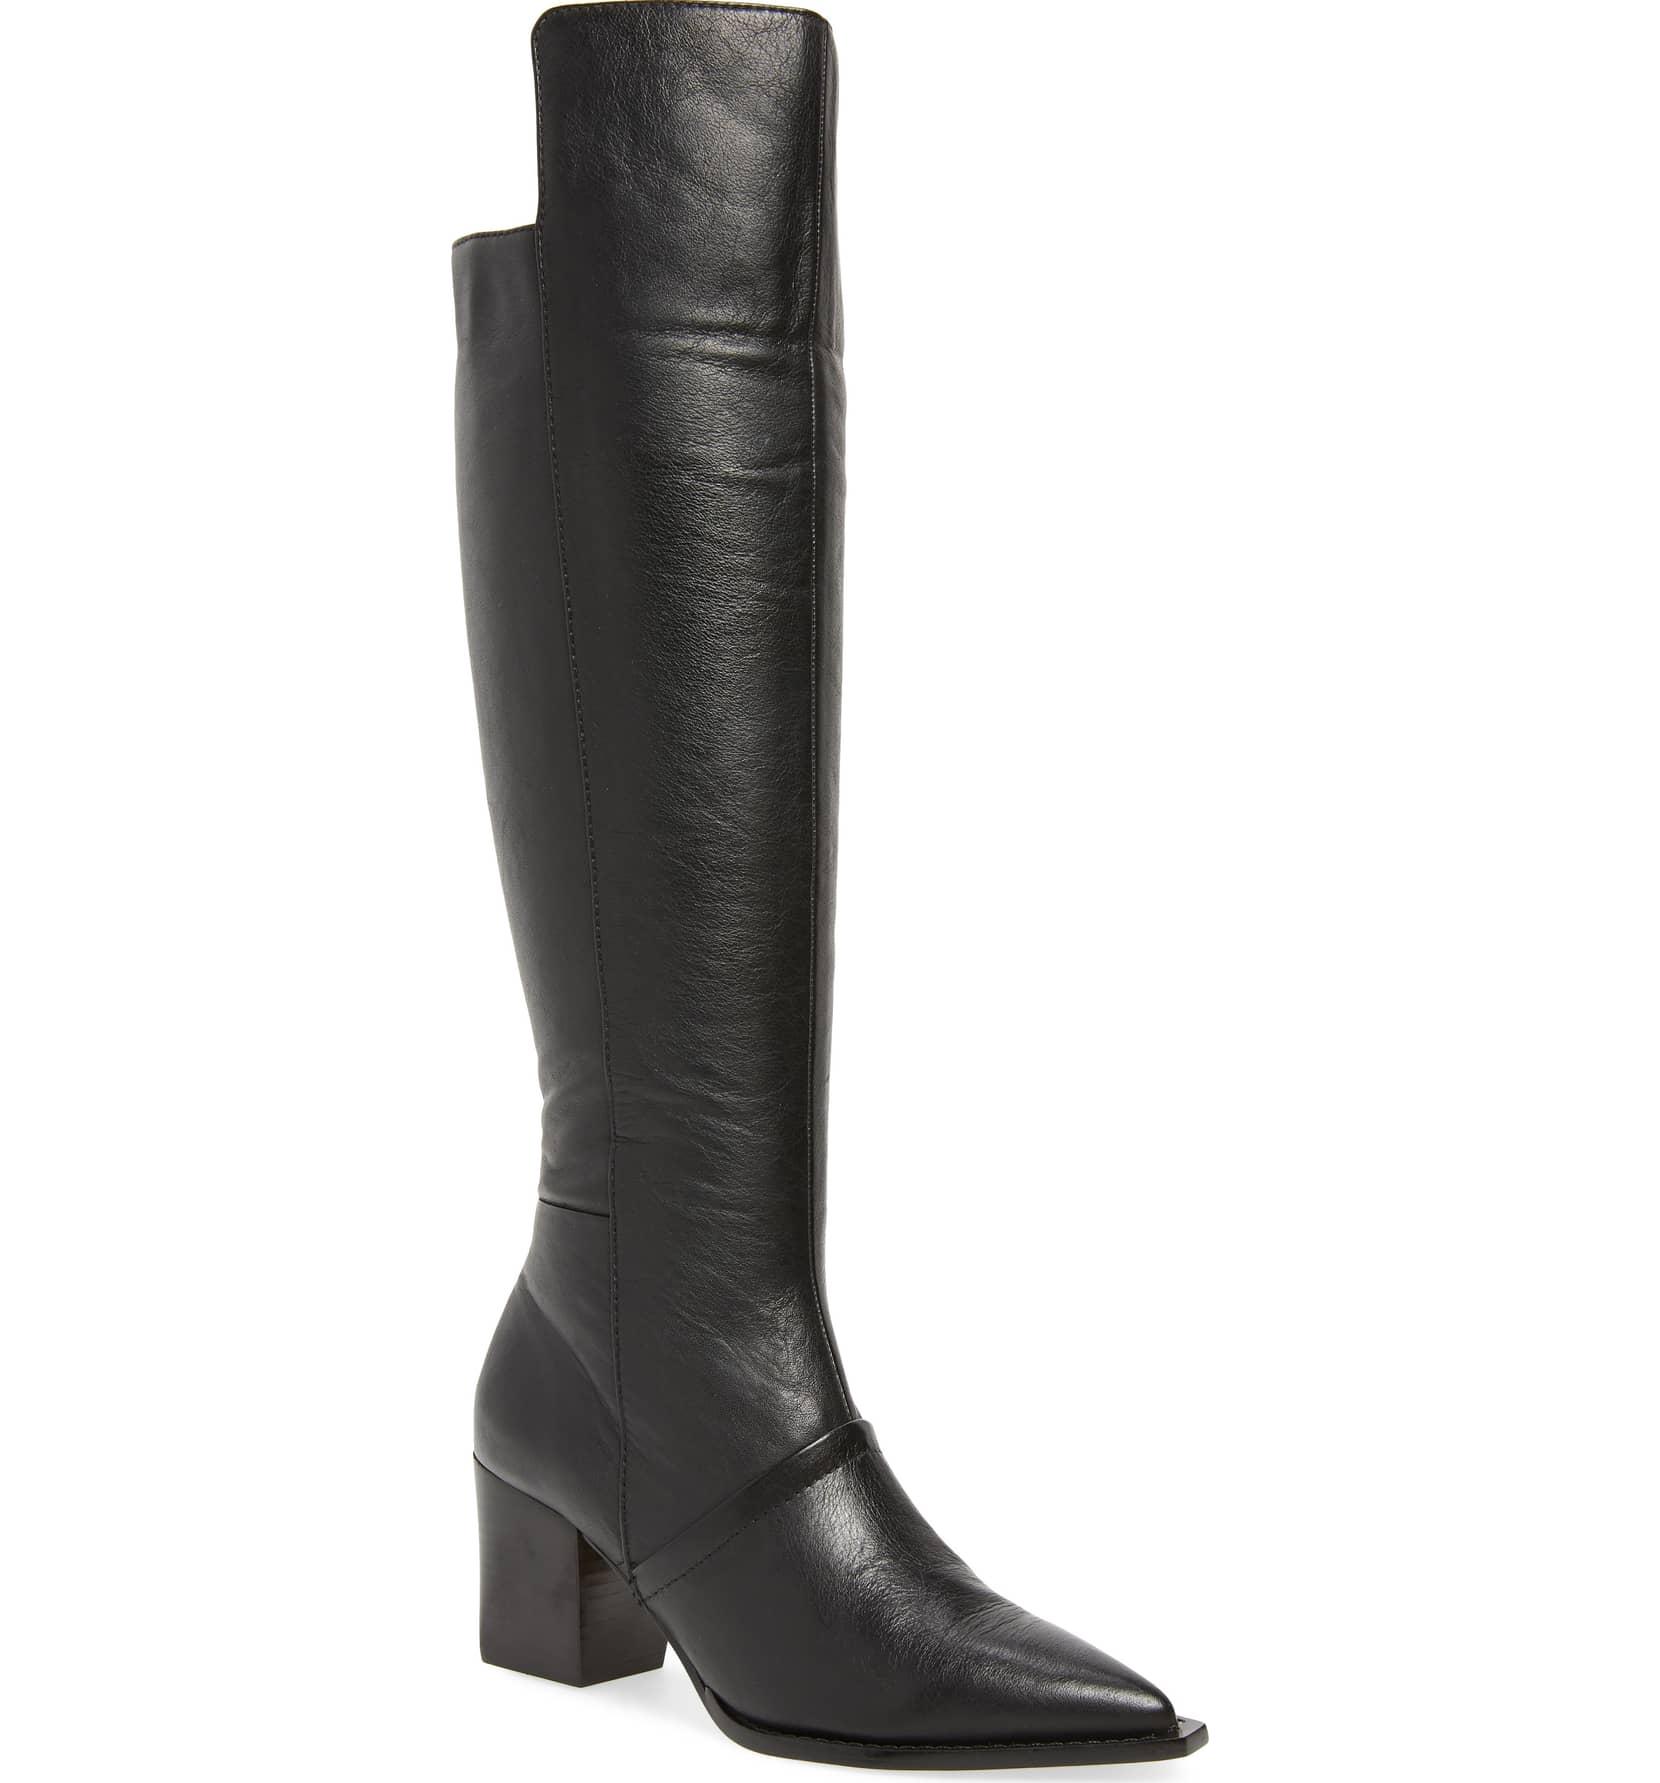 designer high boots